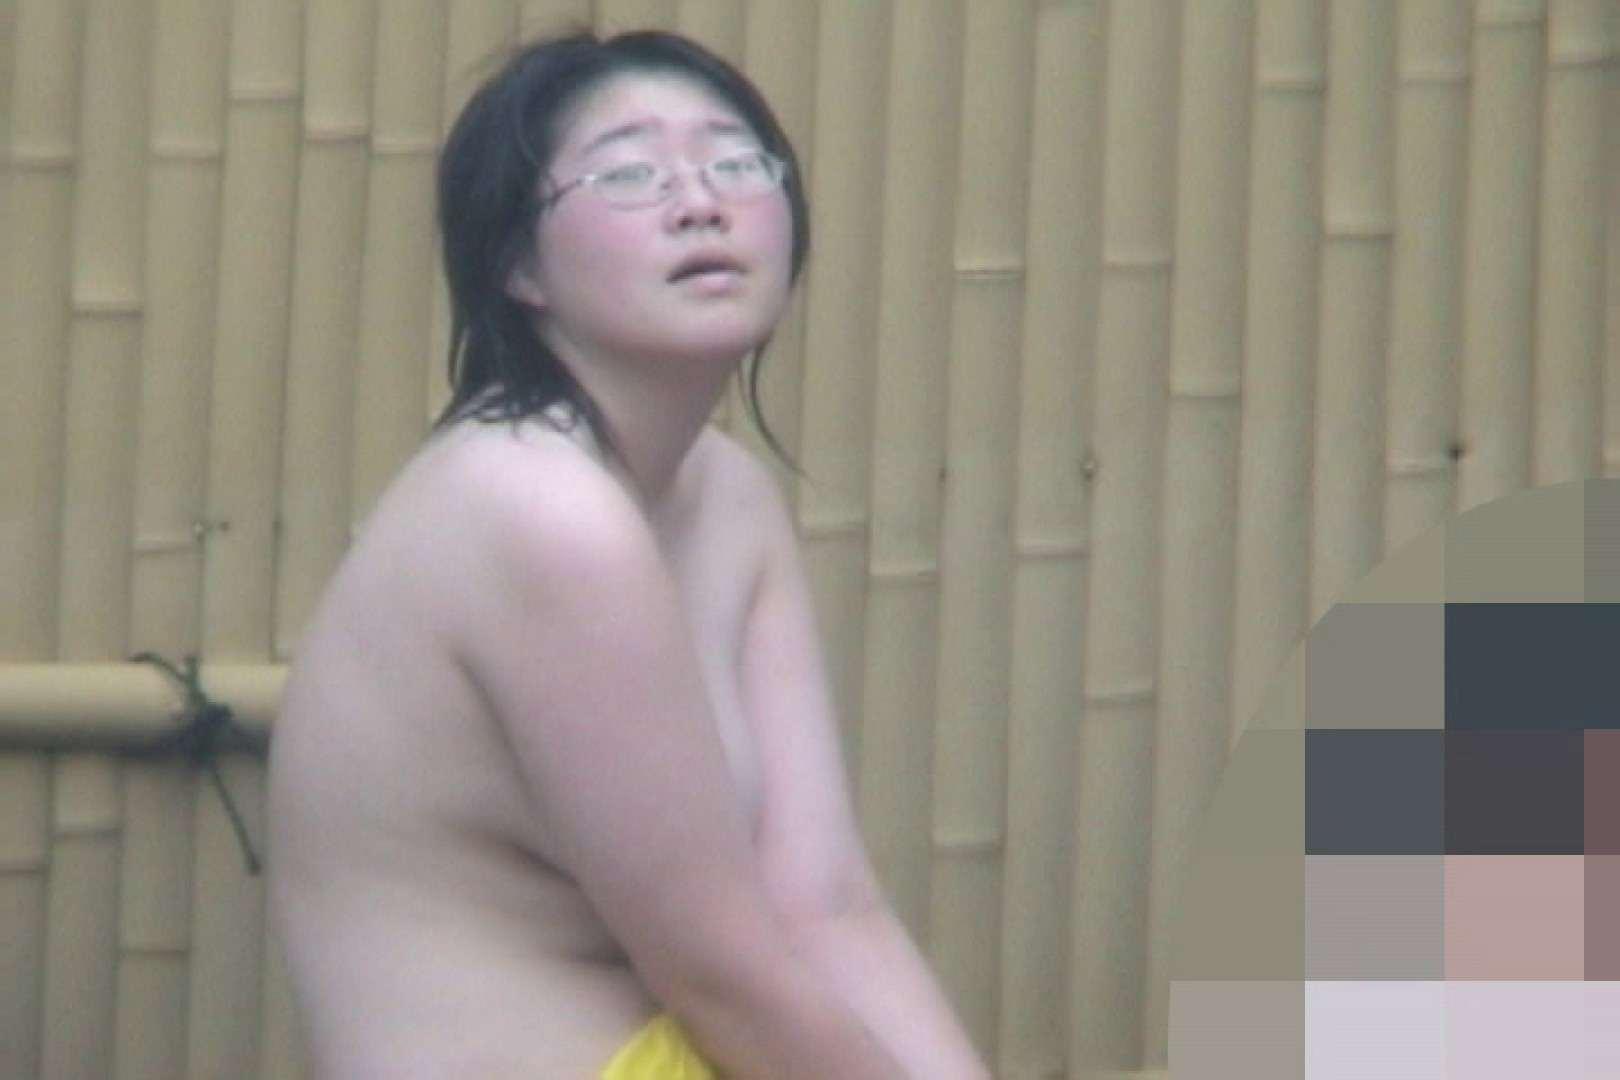 Aquaな露天風呂Vol.46【VIP限定】 OL女体 アダルト動画キャプチャ 98連発 29